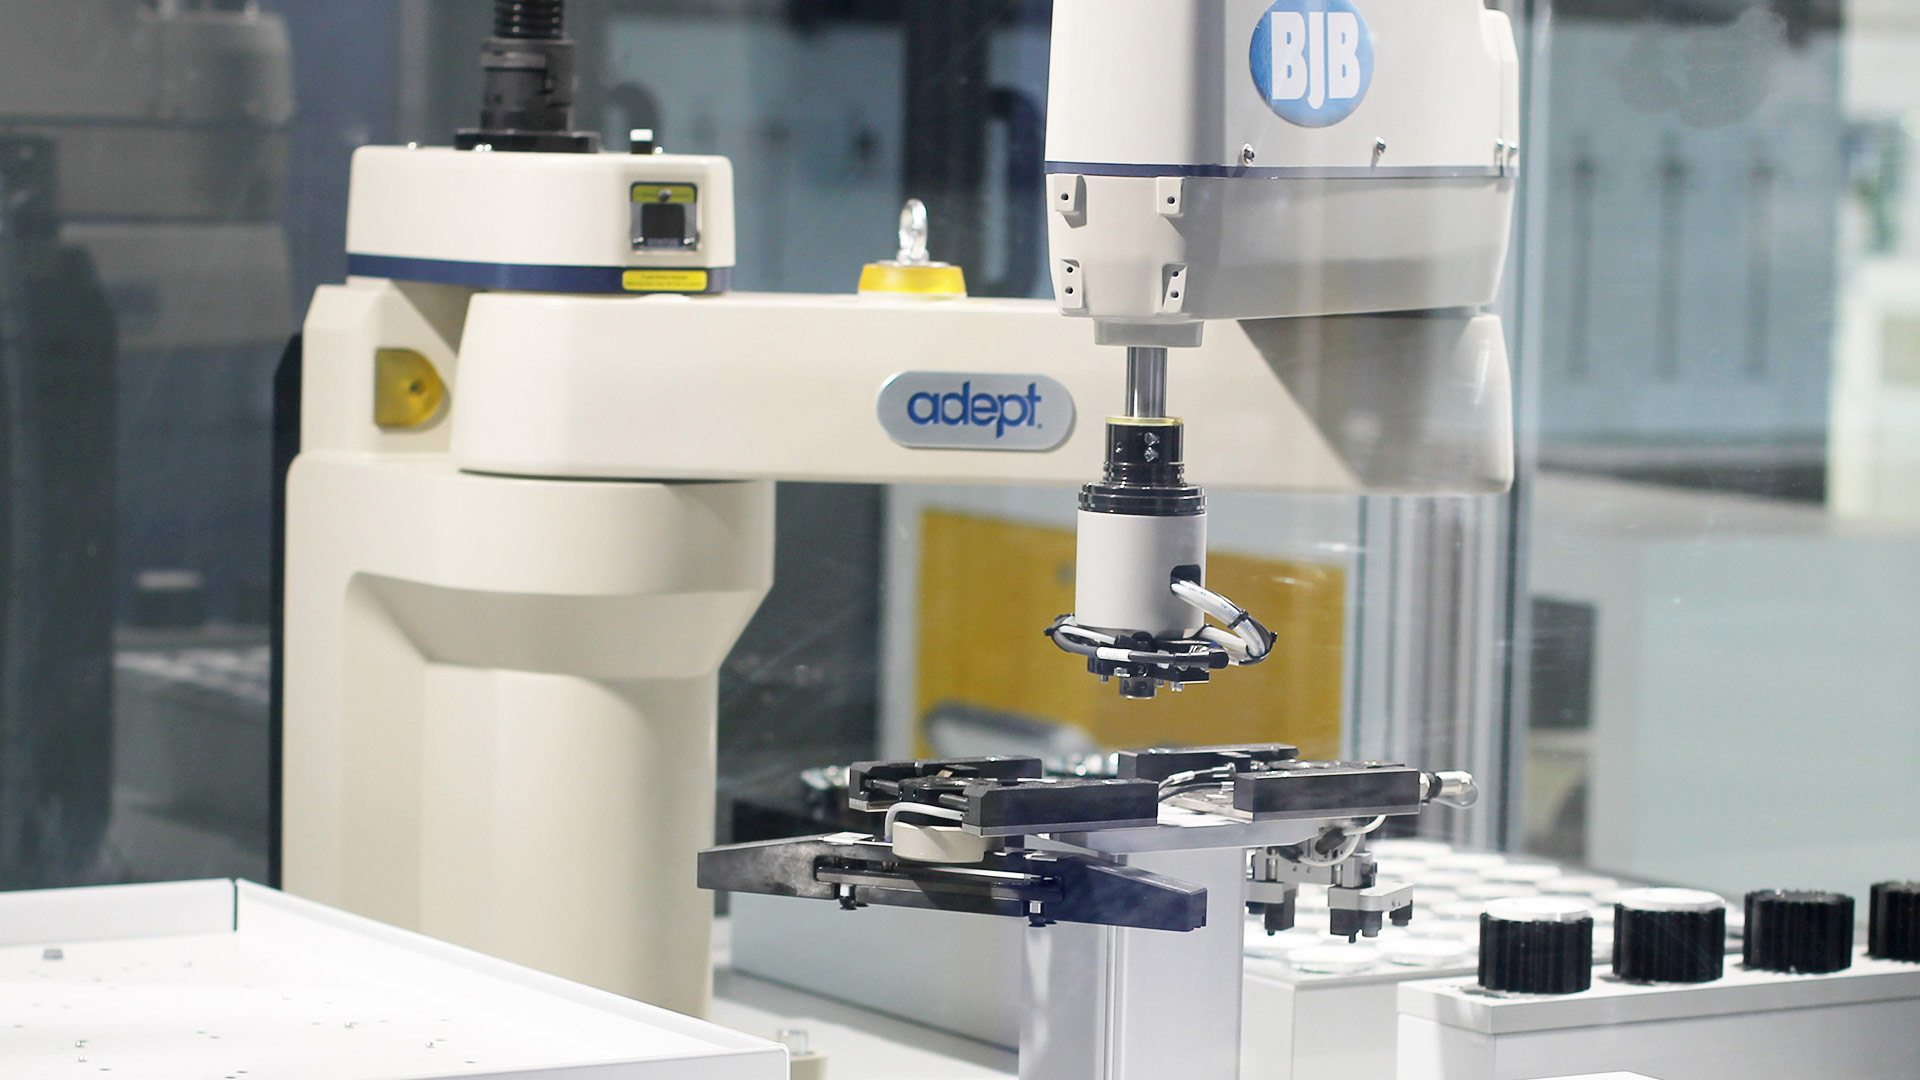 1 Robot de montaje de módulos LED lineales y CoBs (BJB)